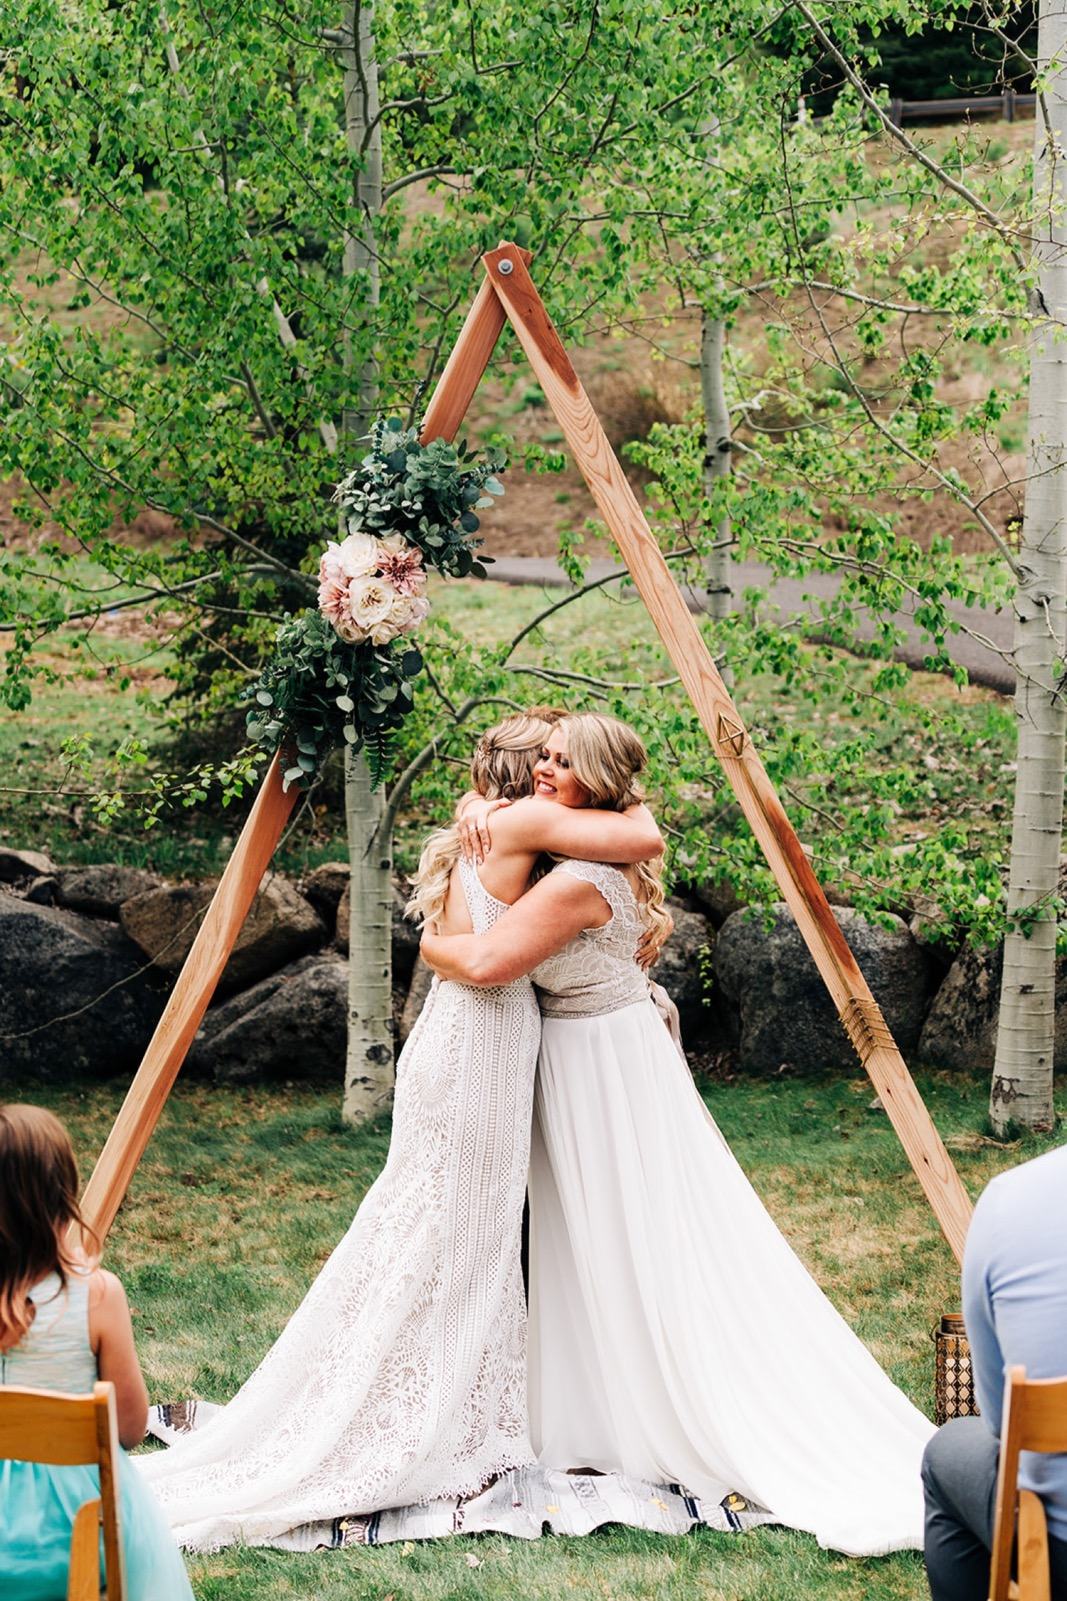 090_falissa_heather_wedding-229.jpg